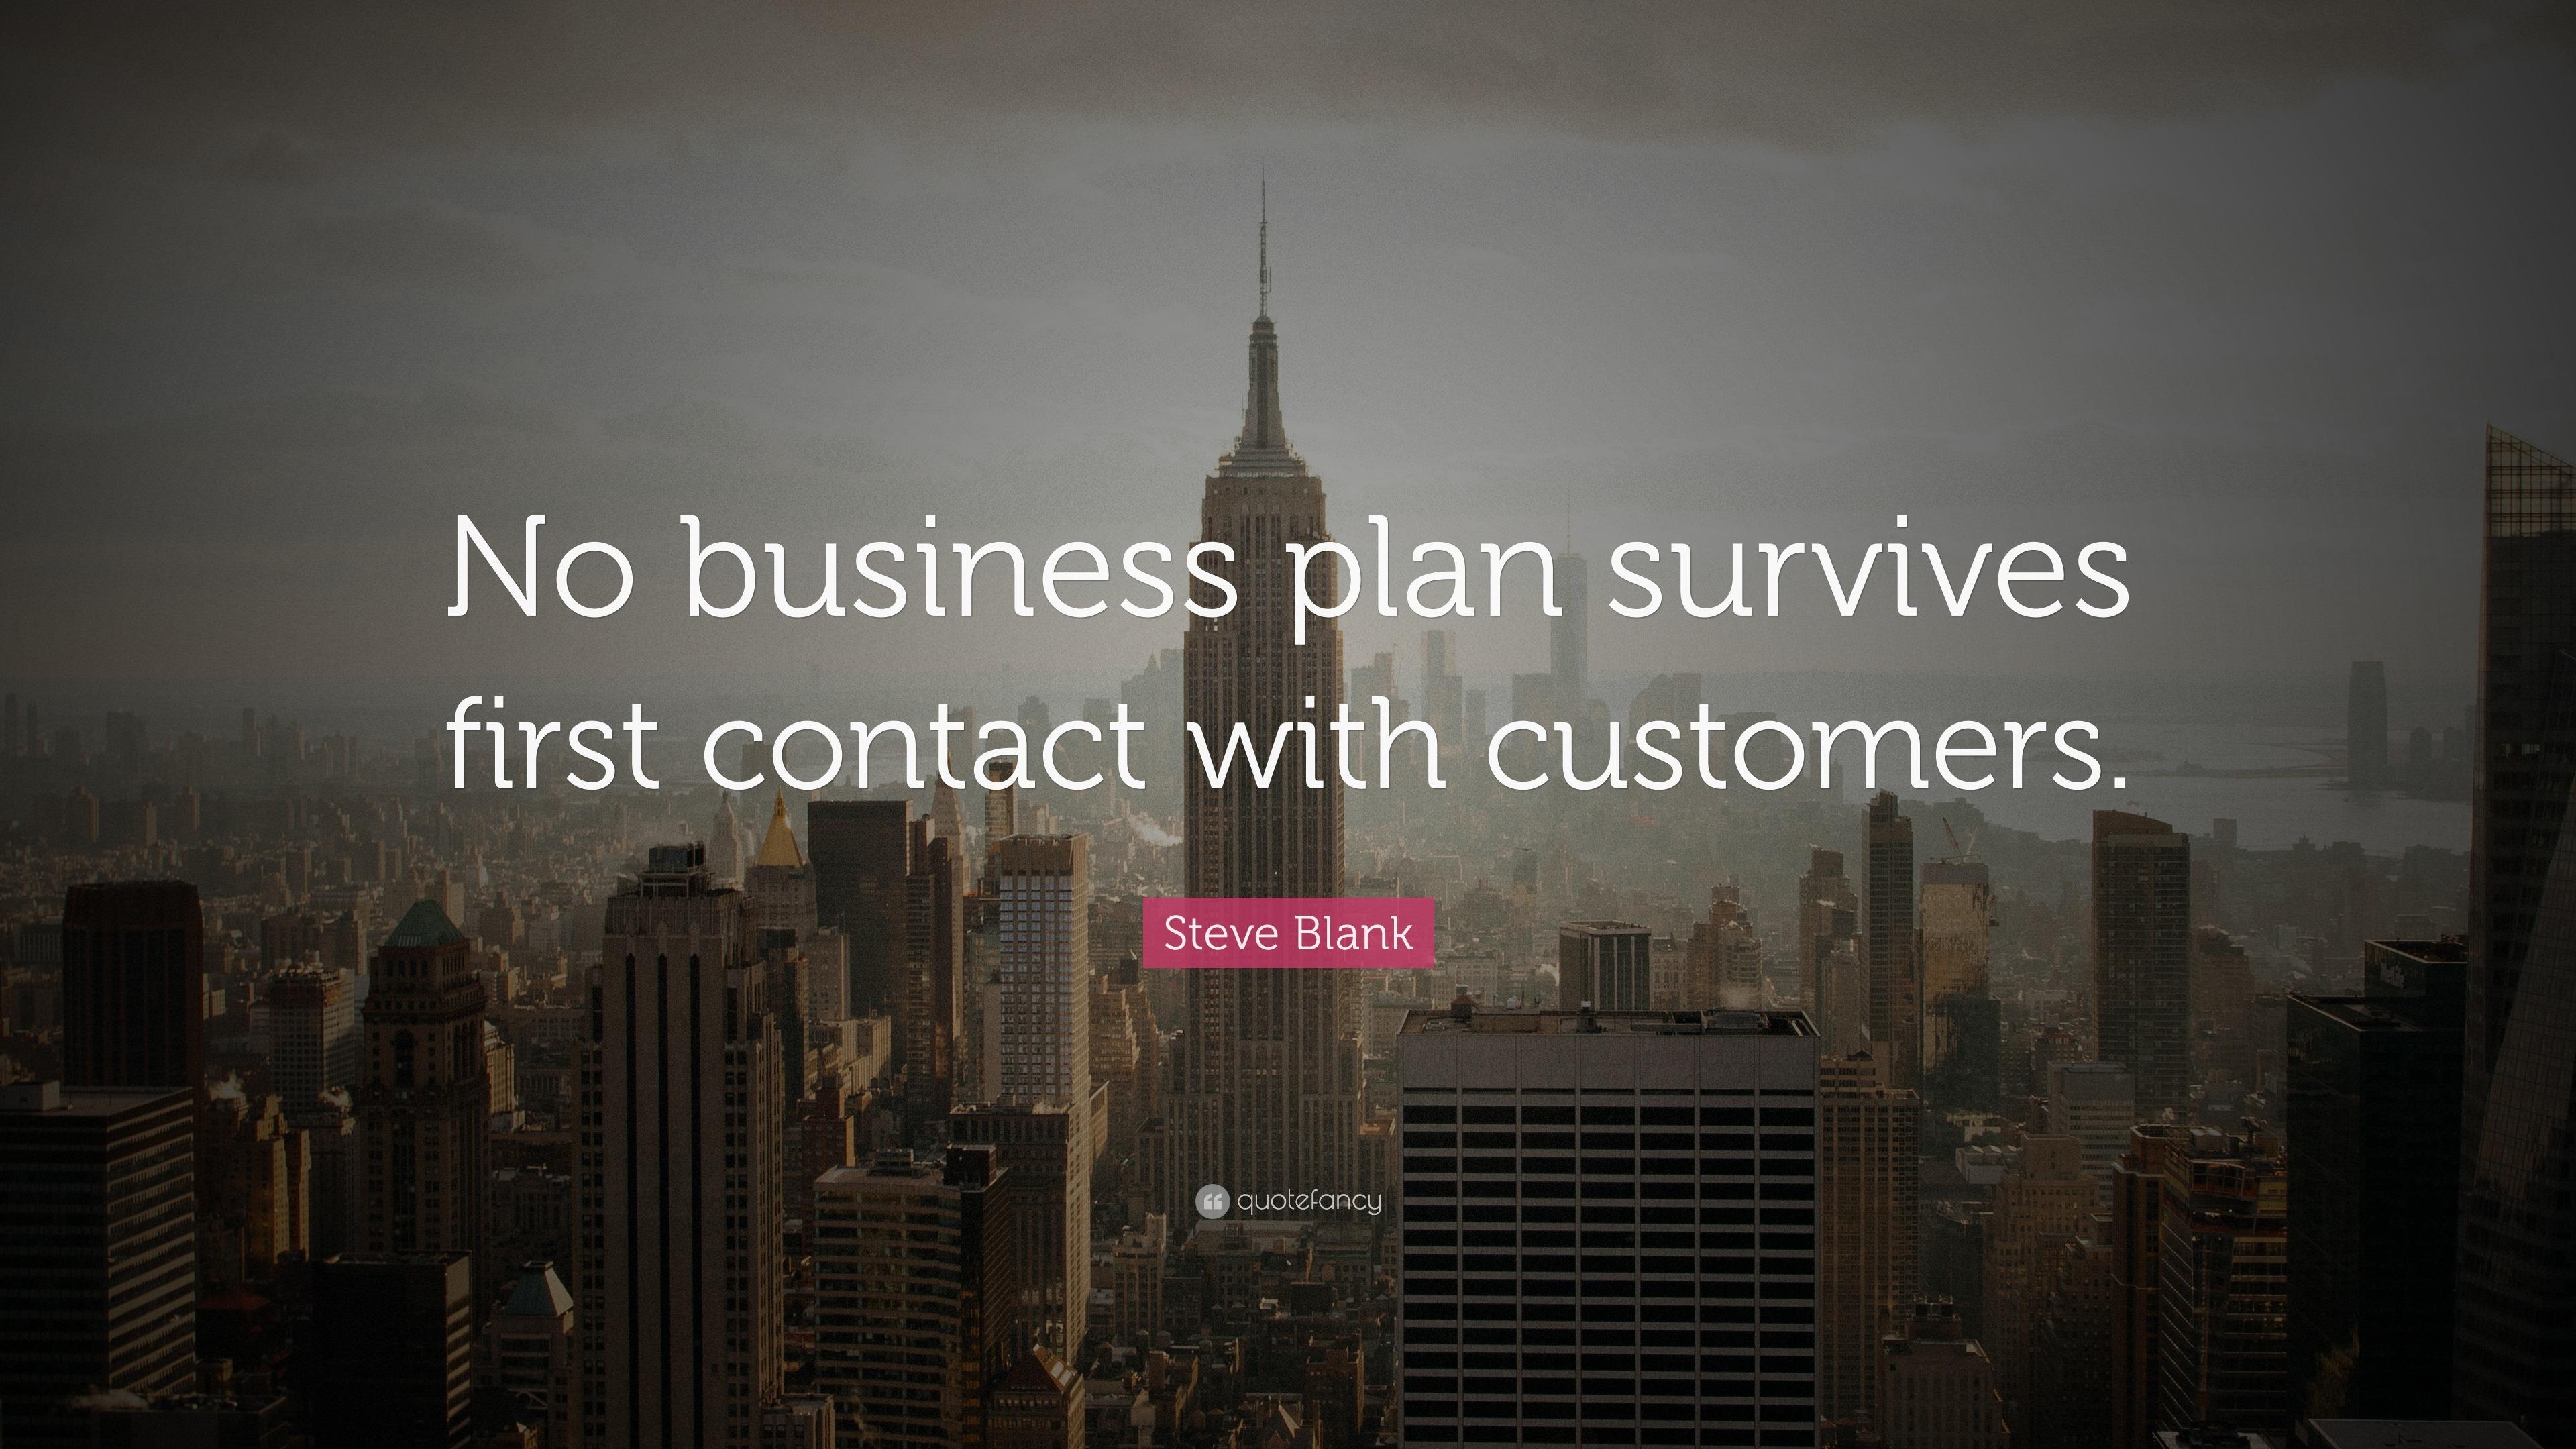 No business plan